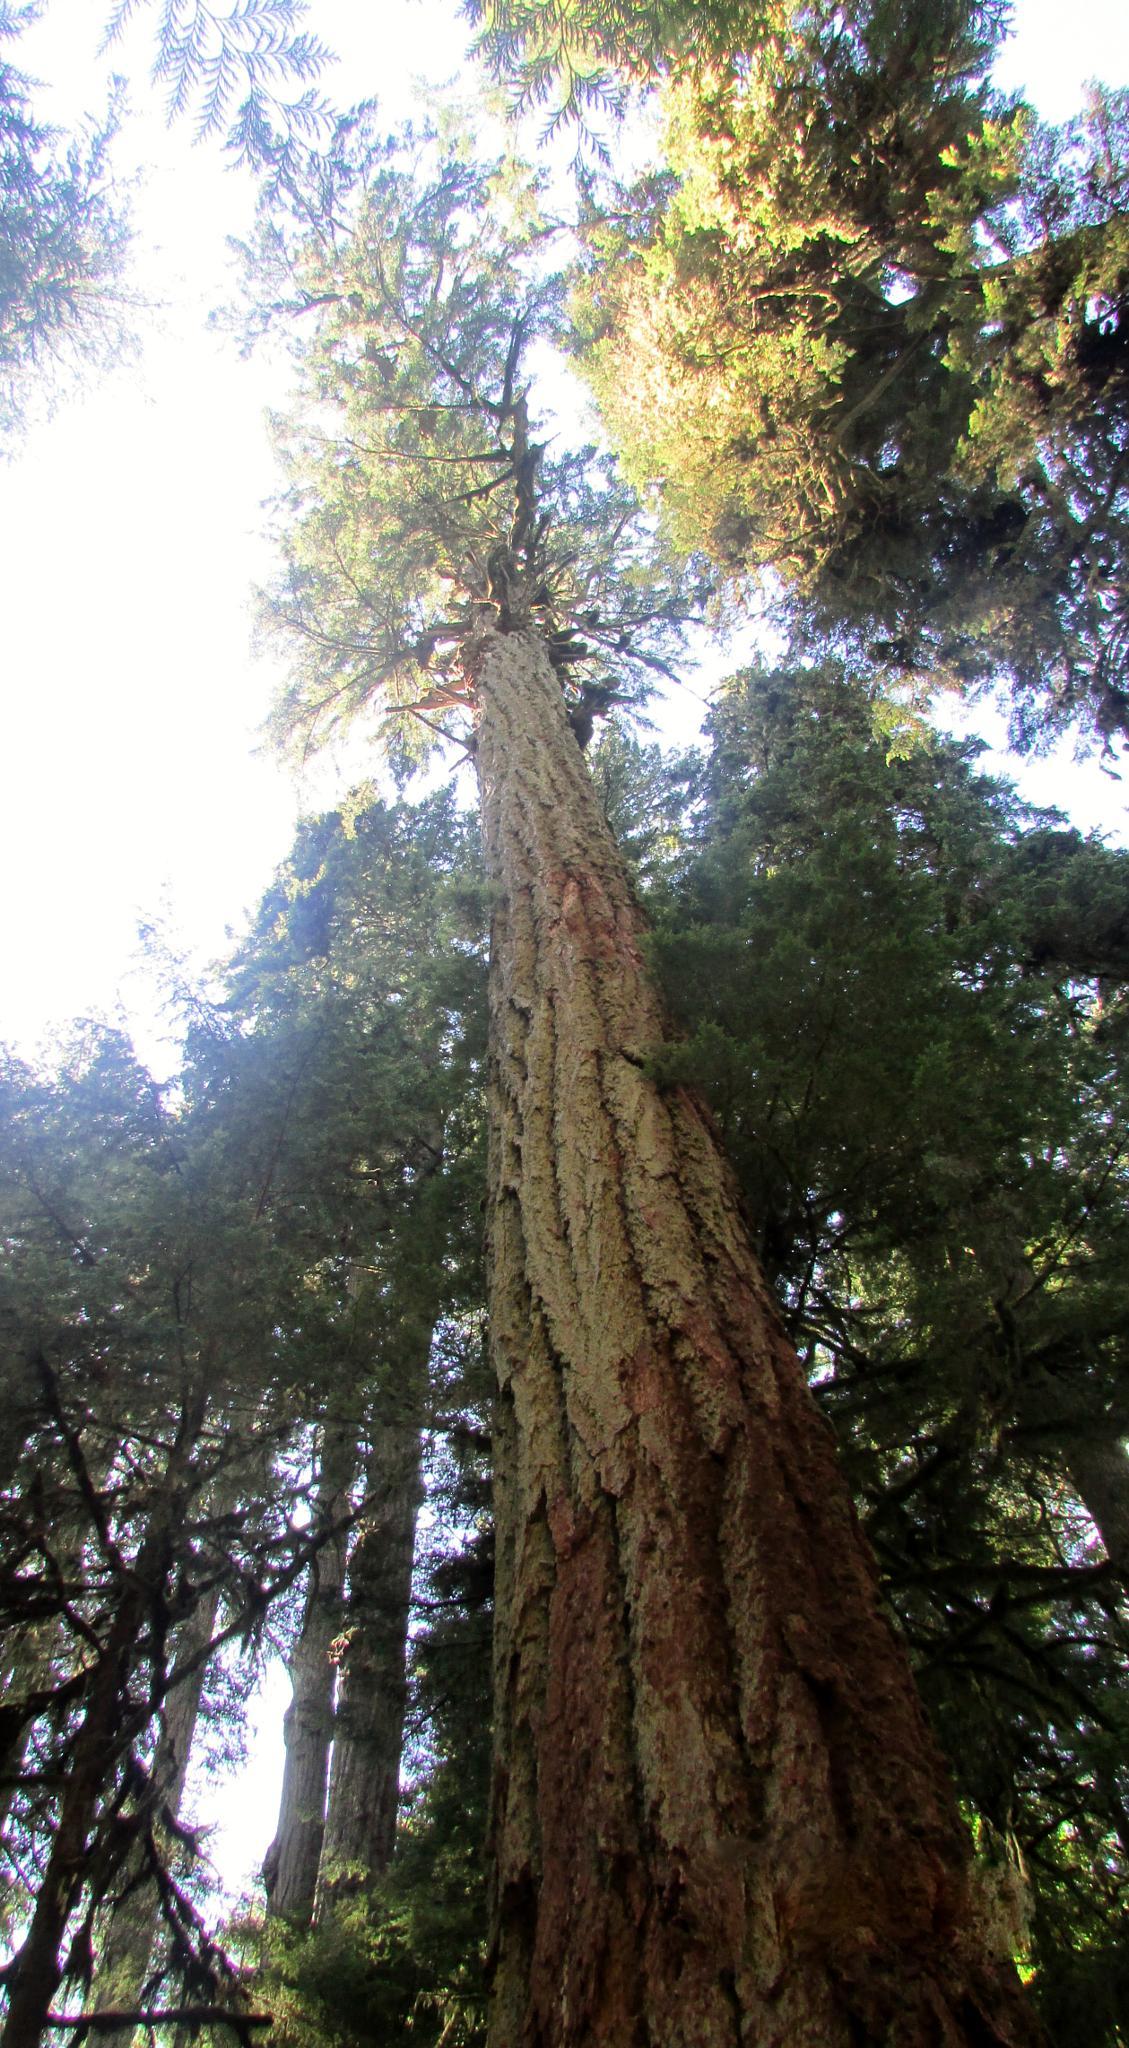 Huge Douglas Fir Trees of Vancouver Island by Lisa Marshall Moore